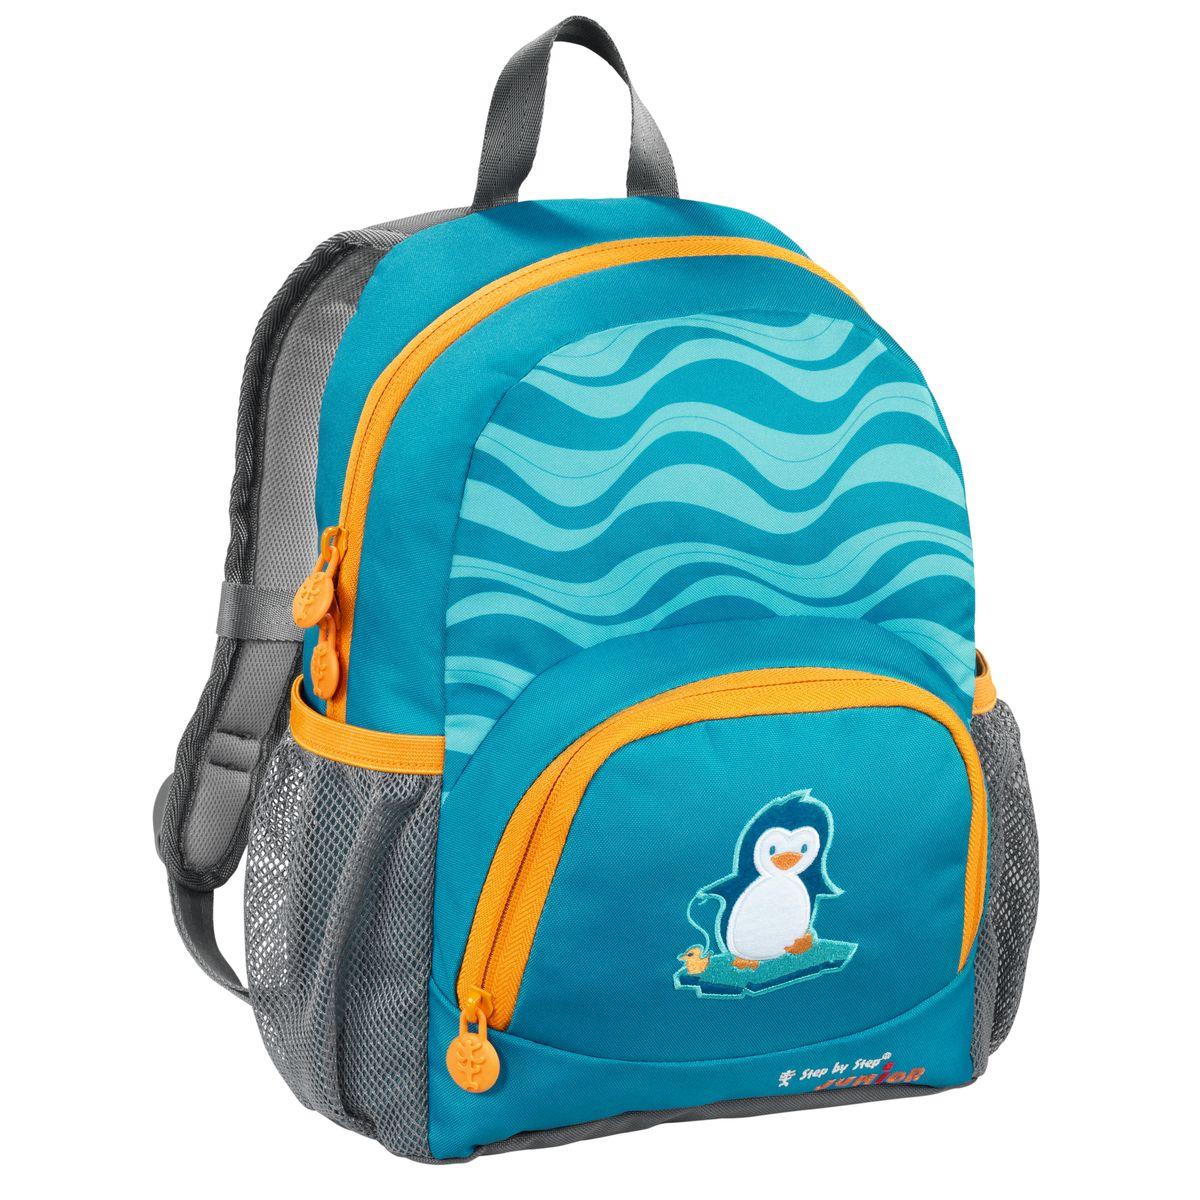 Hama Рюкзак дошкольный Dressy Little Penguin рюкзак juicy сouture рюкзак